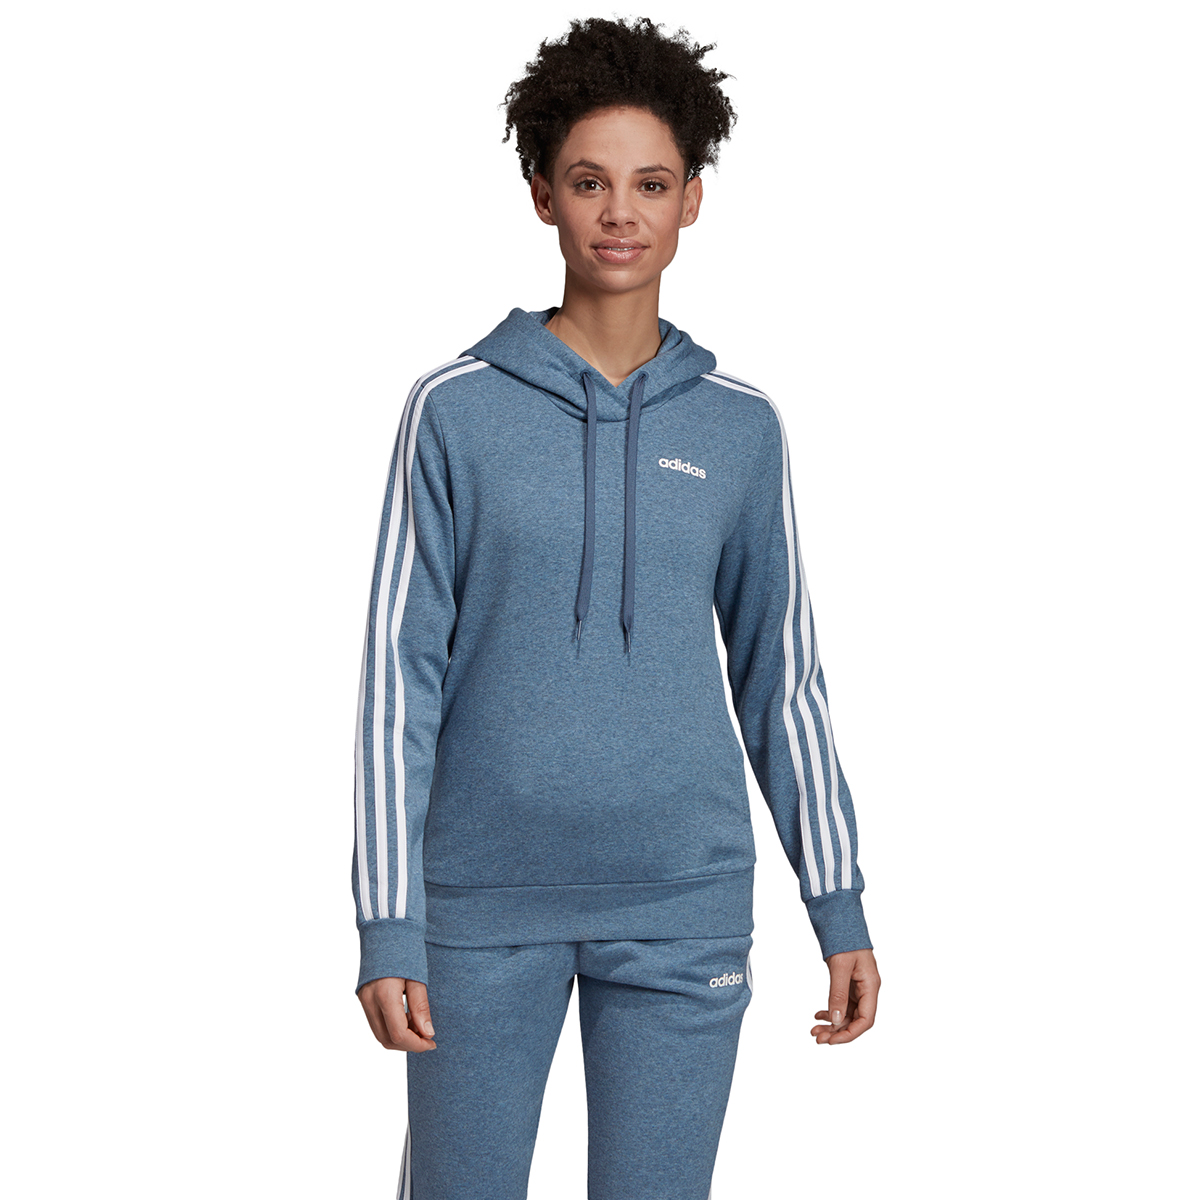 Details about Adidas Women's Essentials 3 Stripes Fleece Hoodie